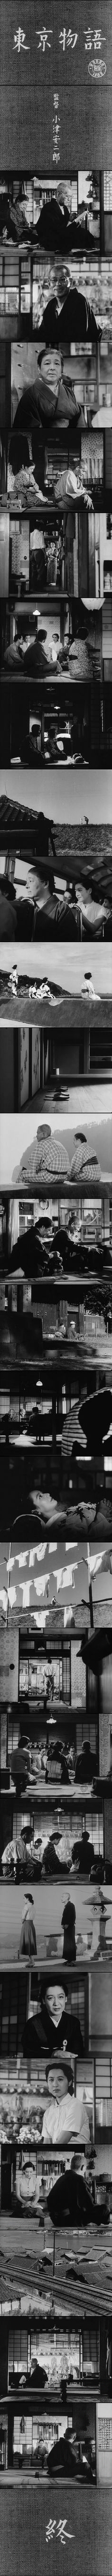 Tokyo Story (1953) Directed by Yasujirō Ozu.